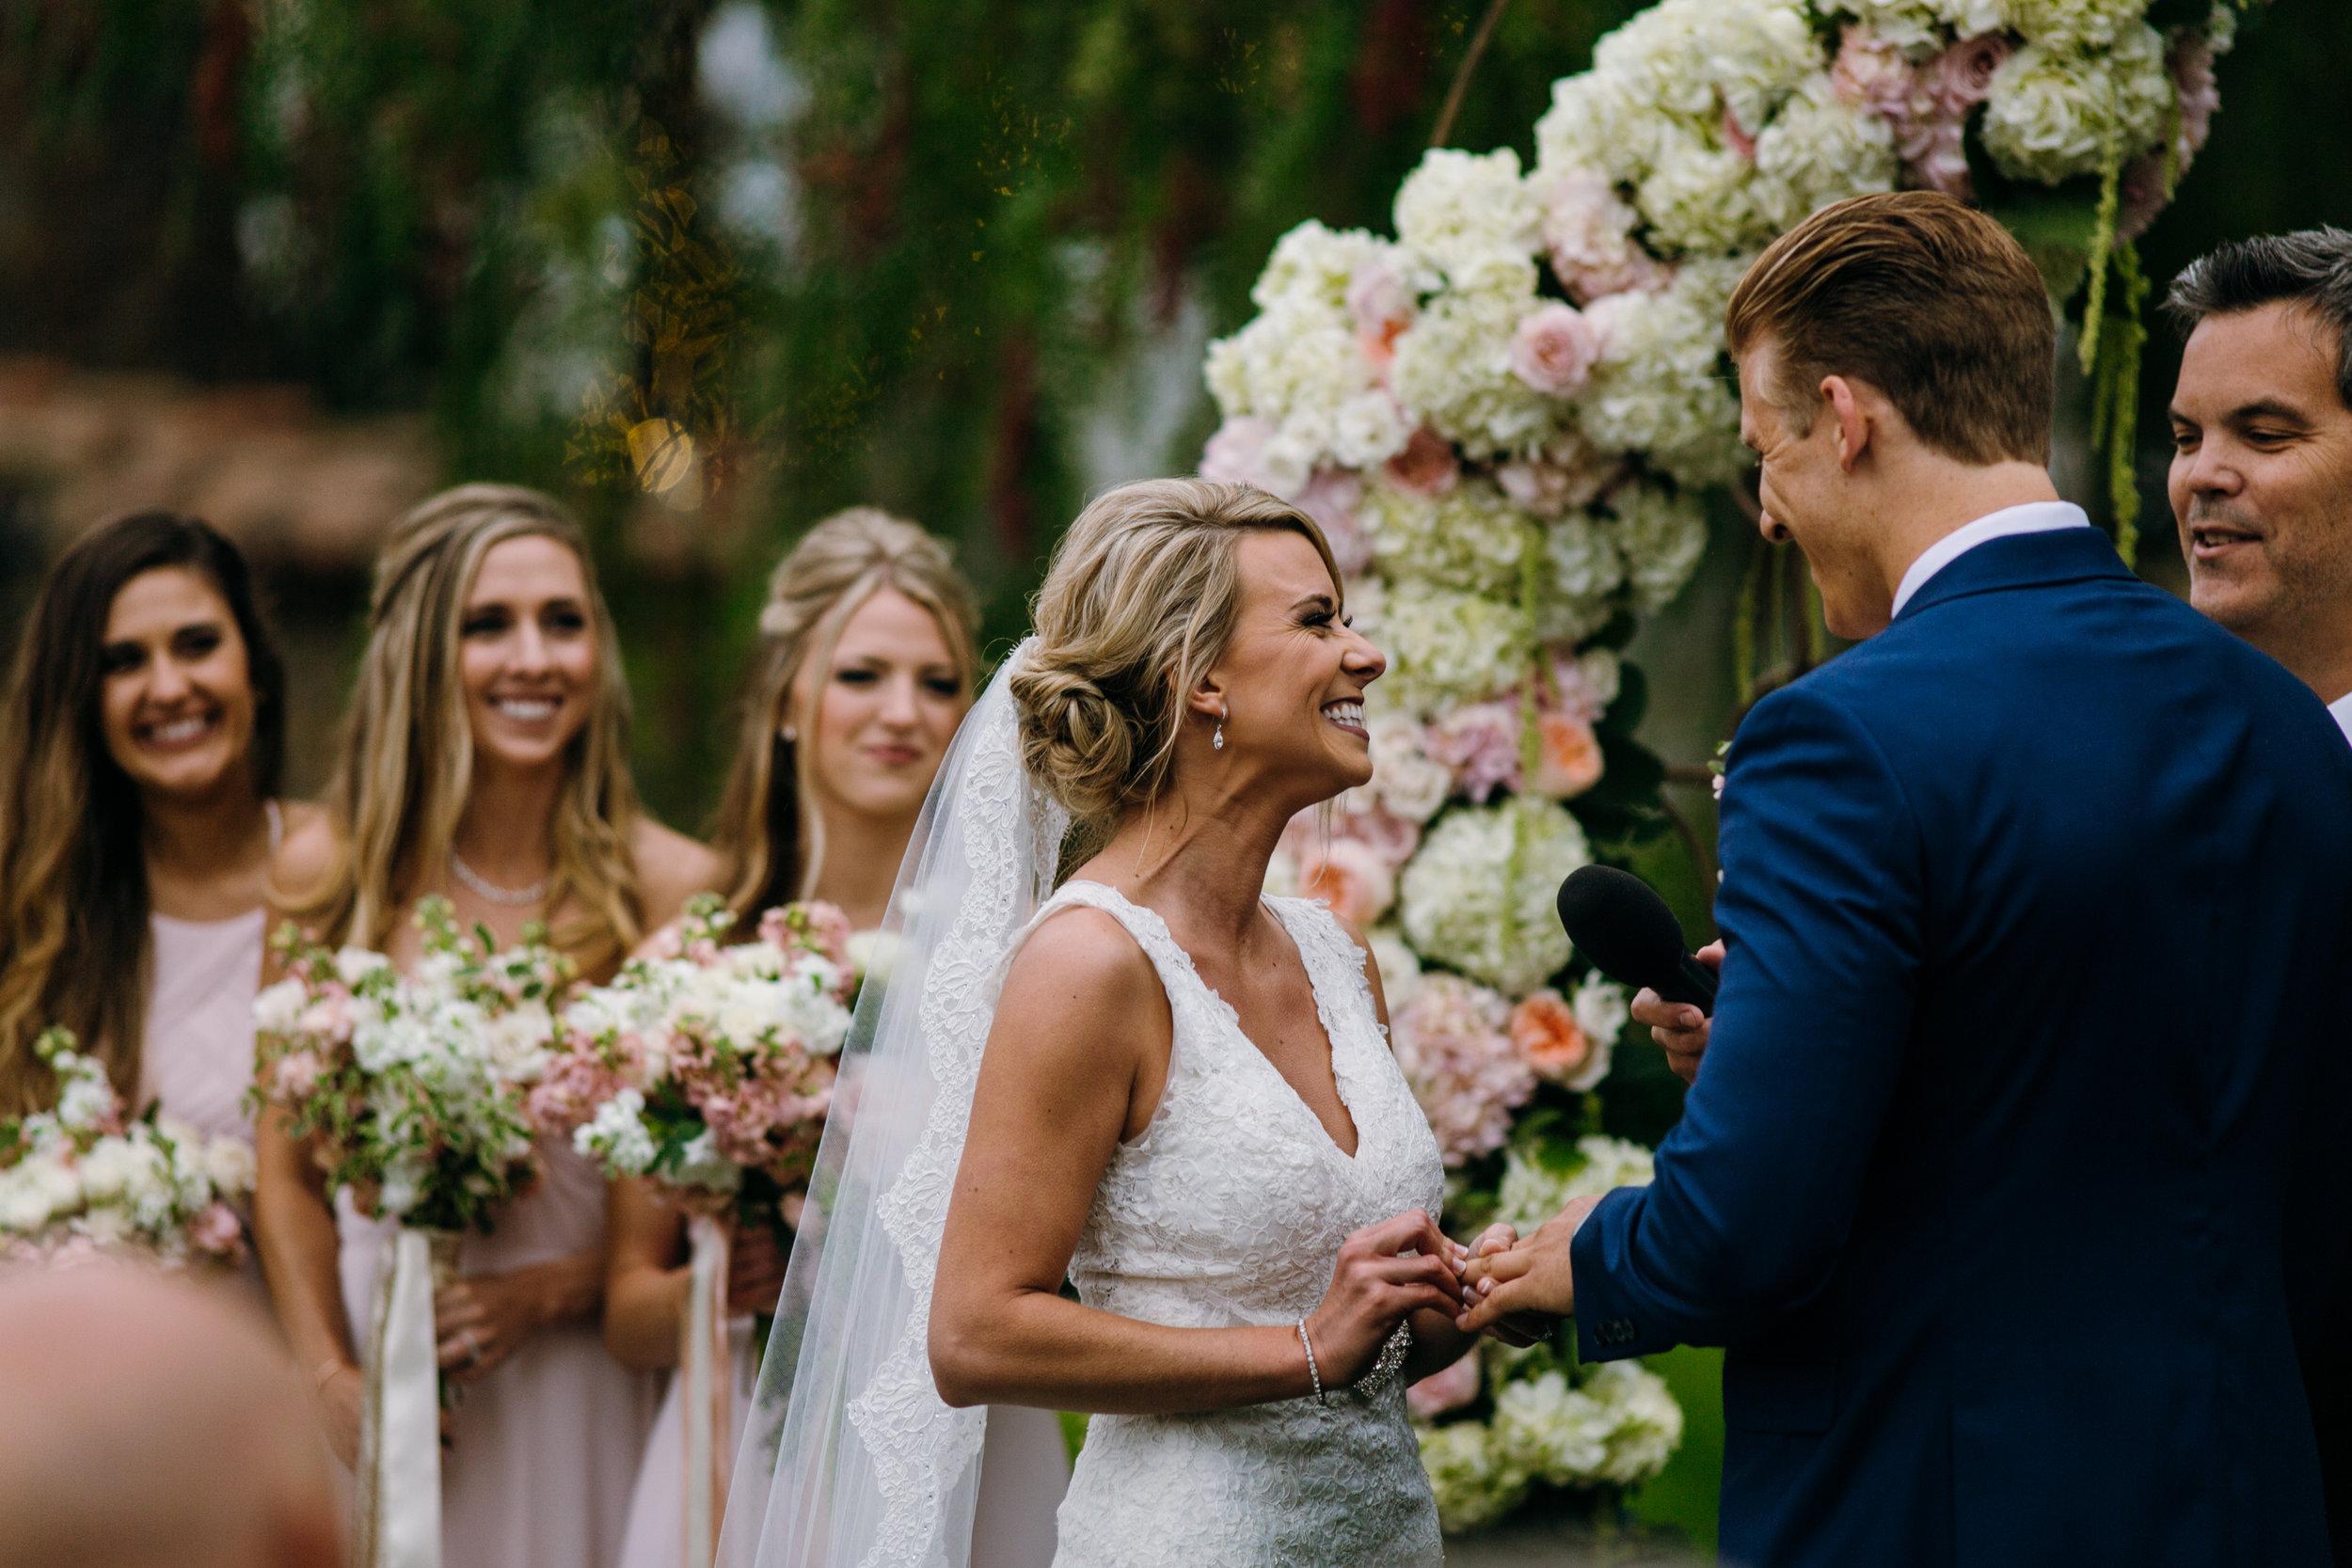 KaraNixonWeddings-LakeOakMeadows-Temecula-Wedding-35.jpg